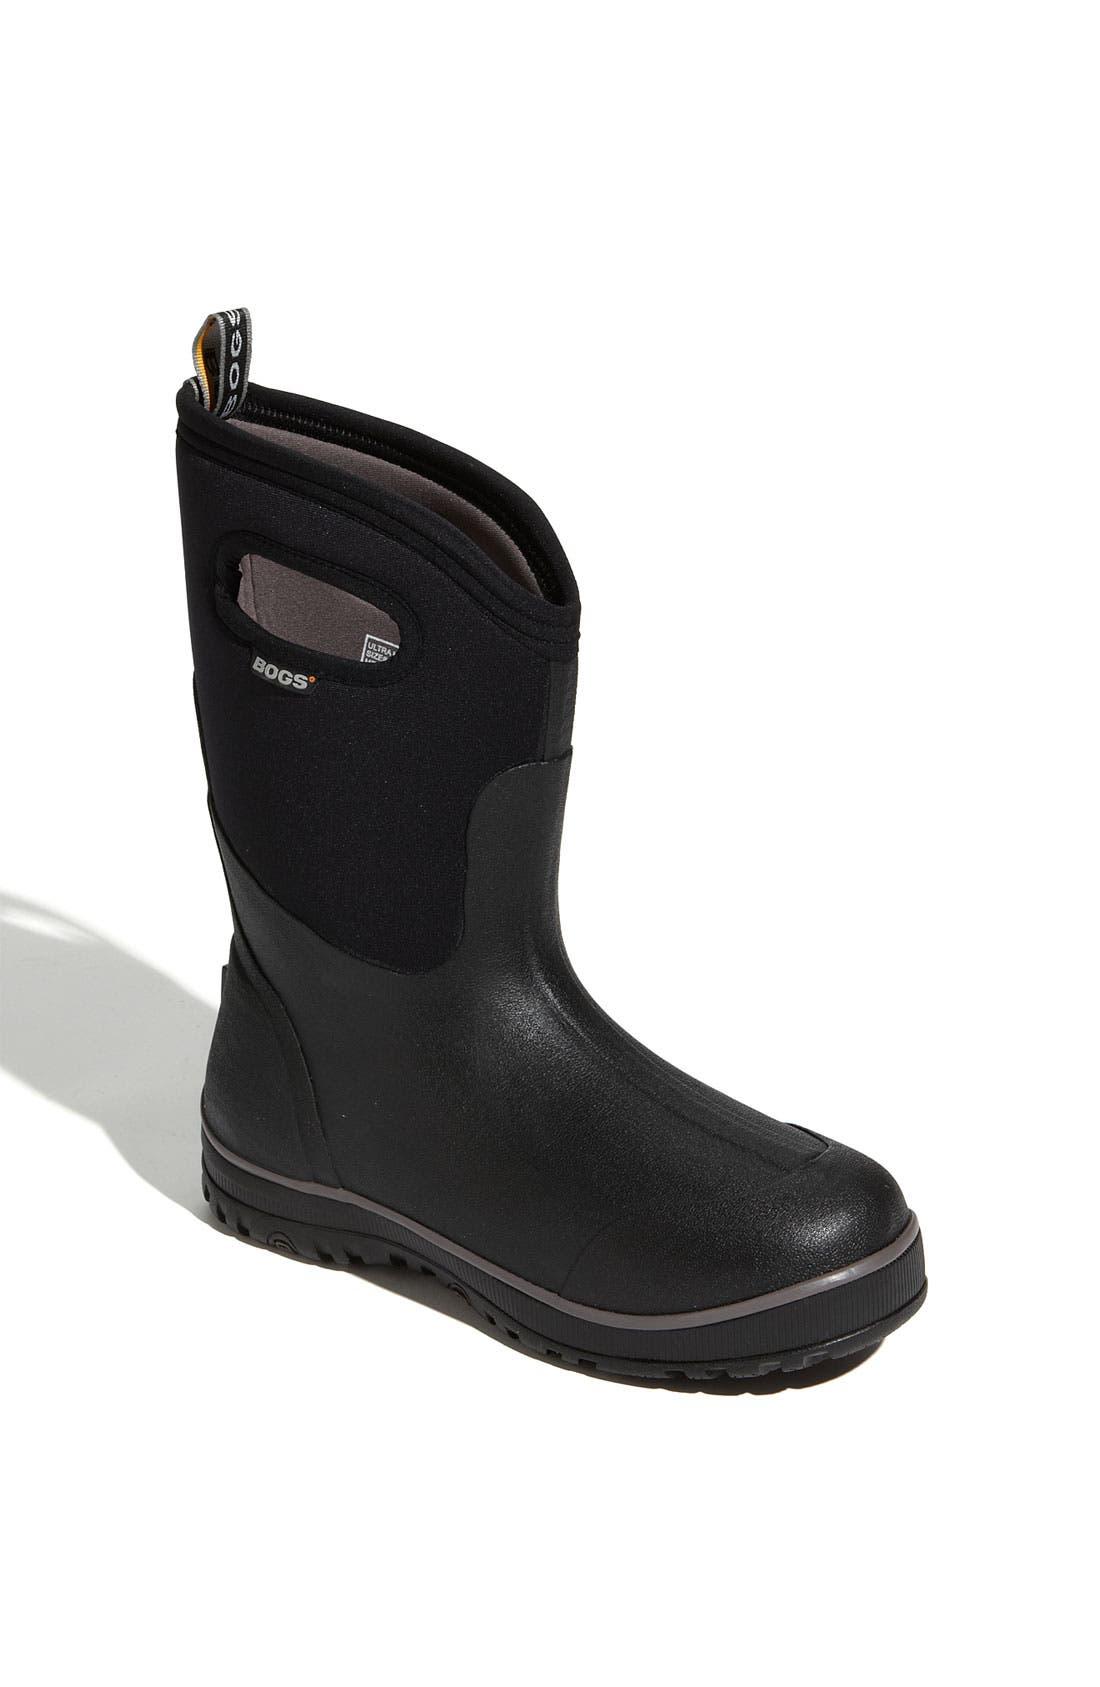 BOGS 'Classic Ultra' Mid High Rain Boot